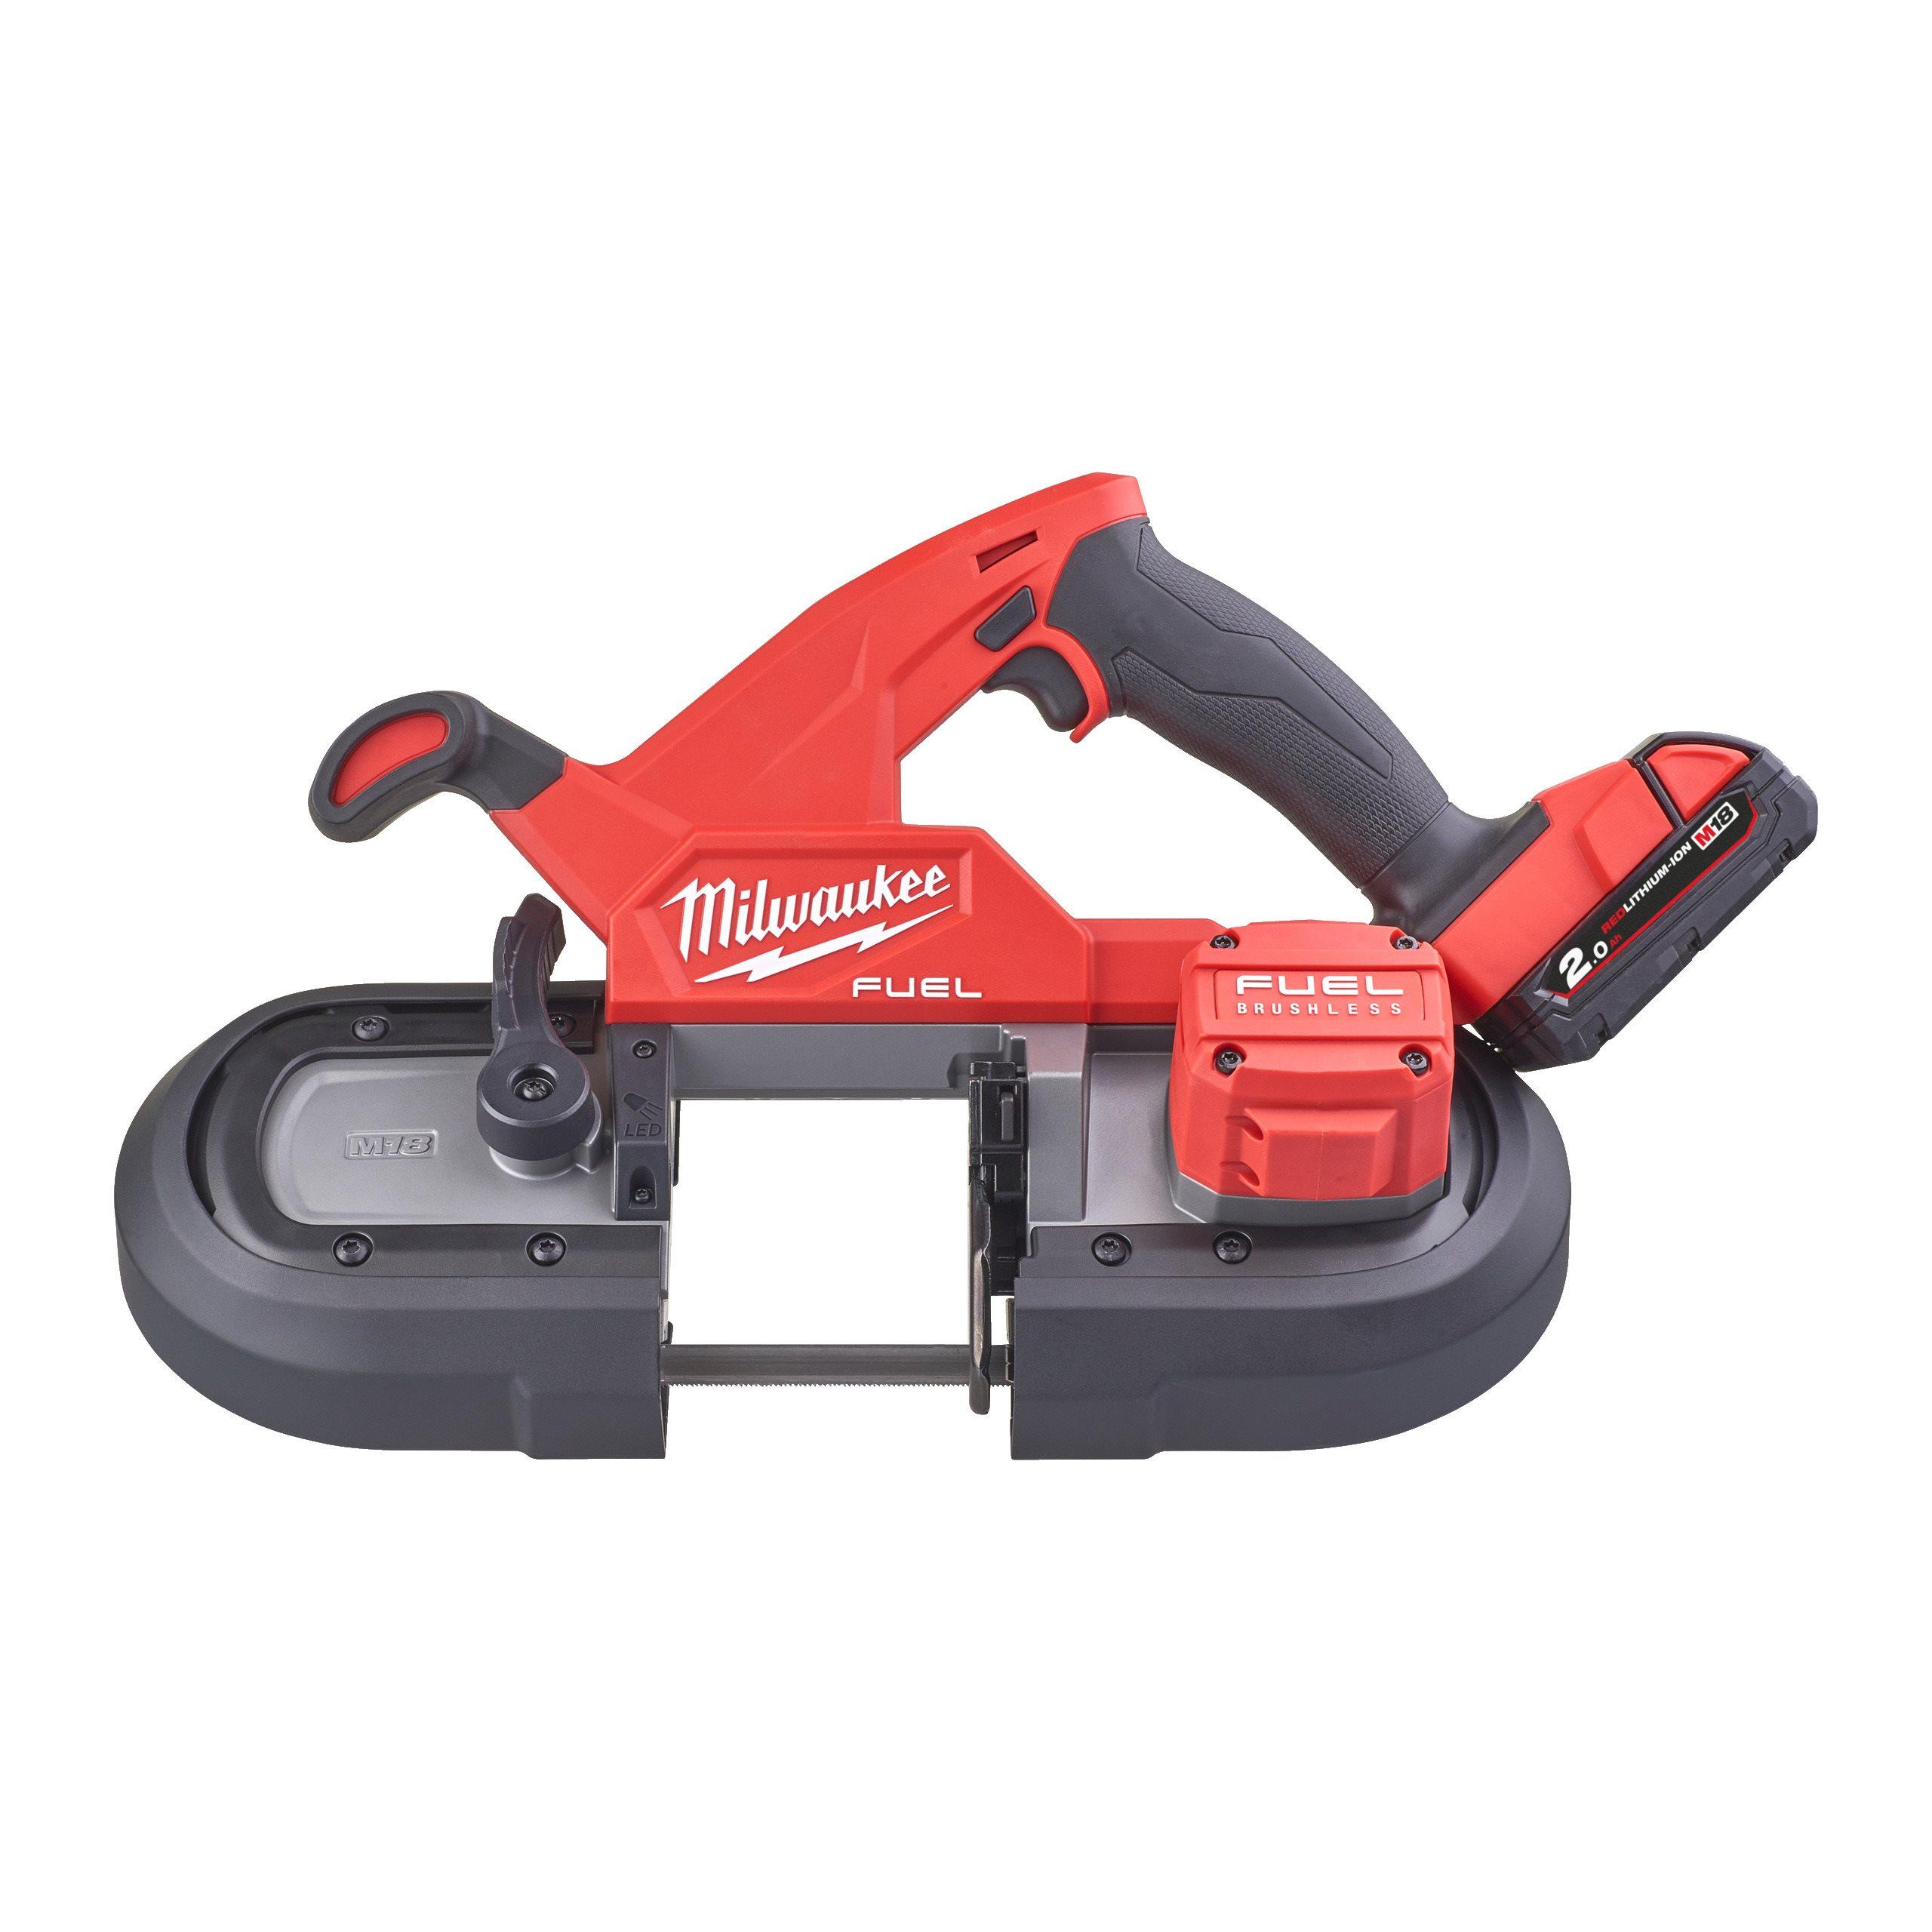 M18™ kompakt handdammsugare | M18 CV | Milwaukee Tools Sverige